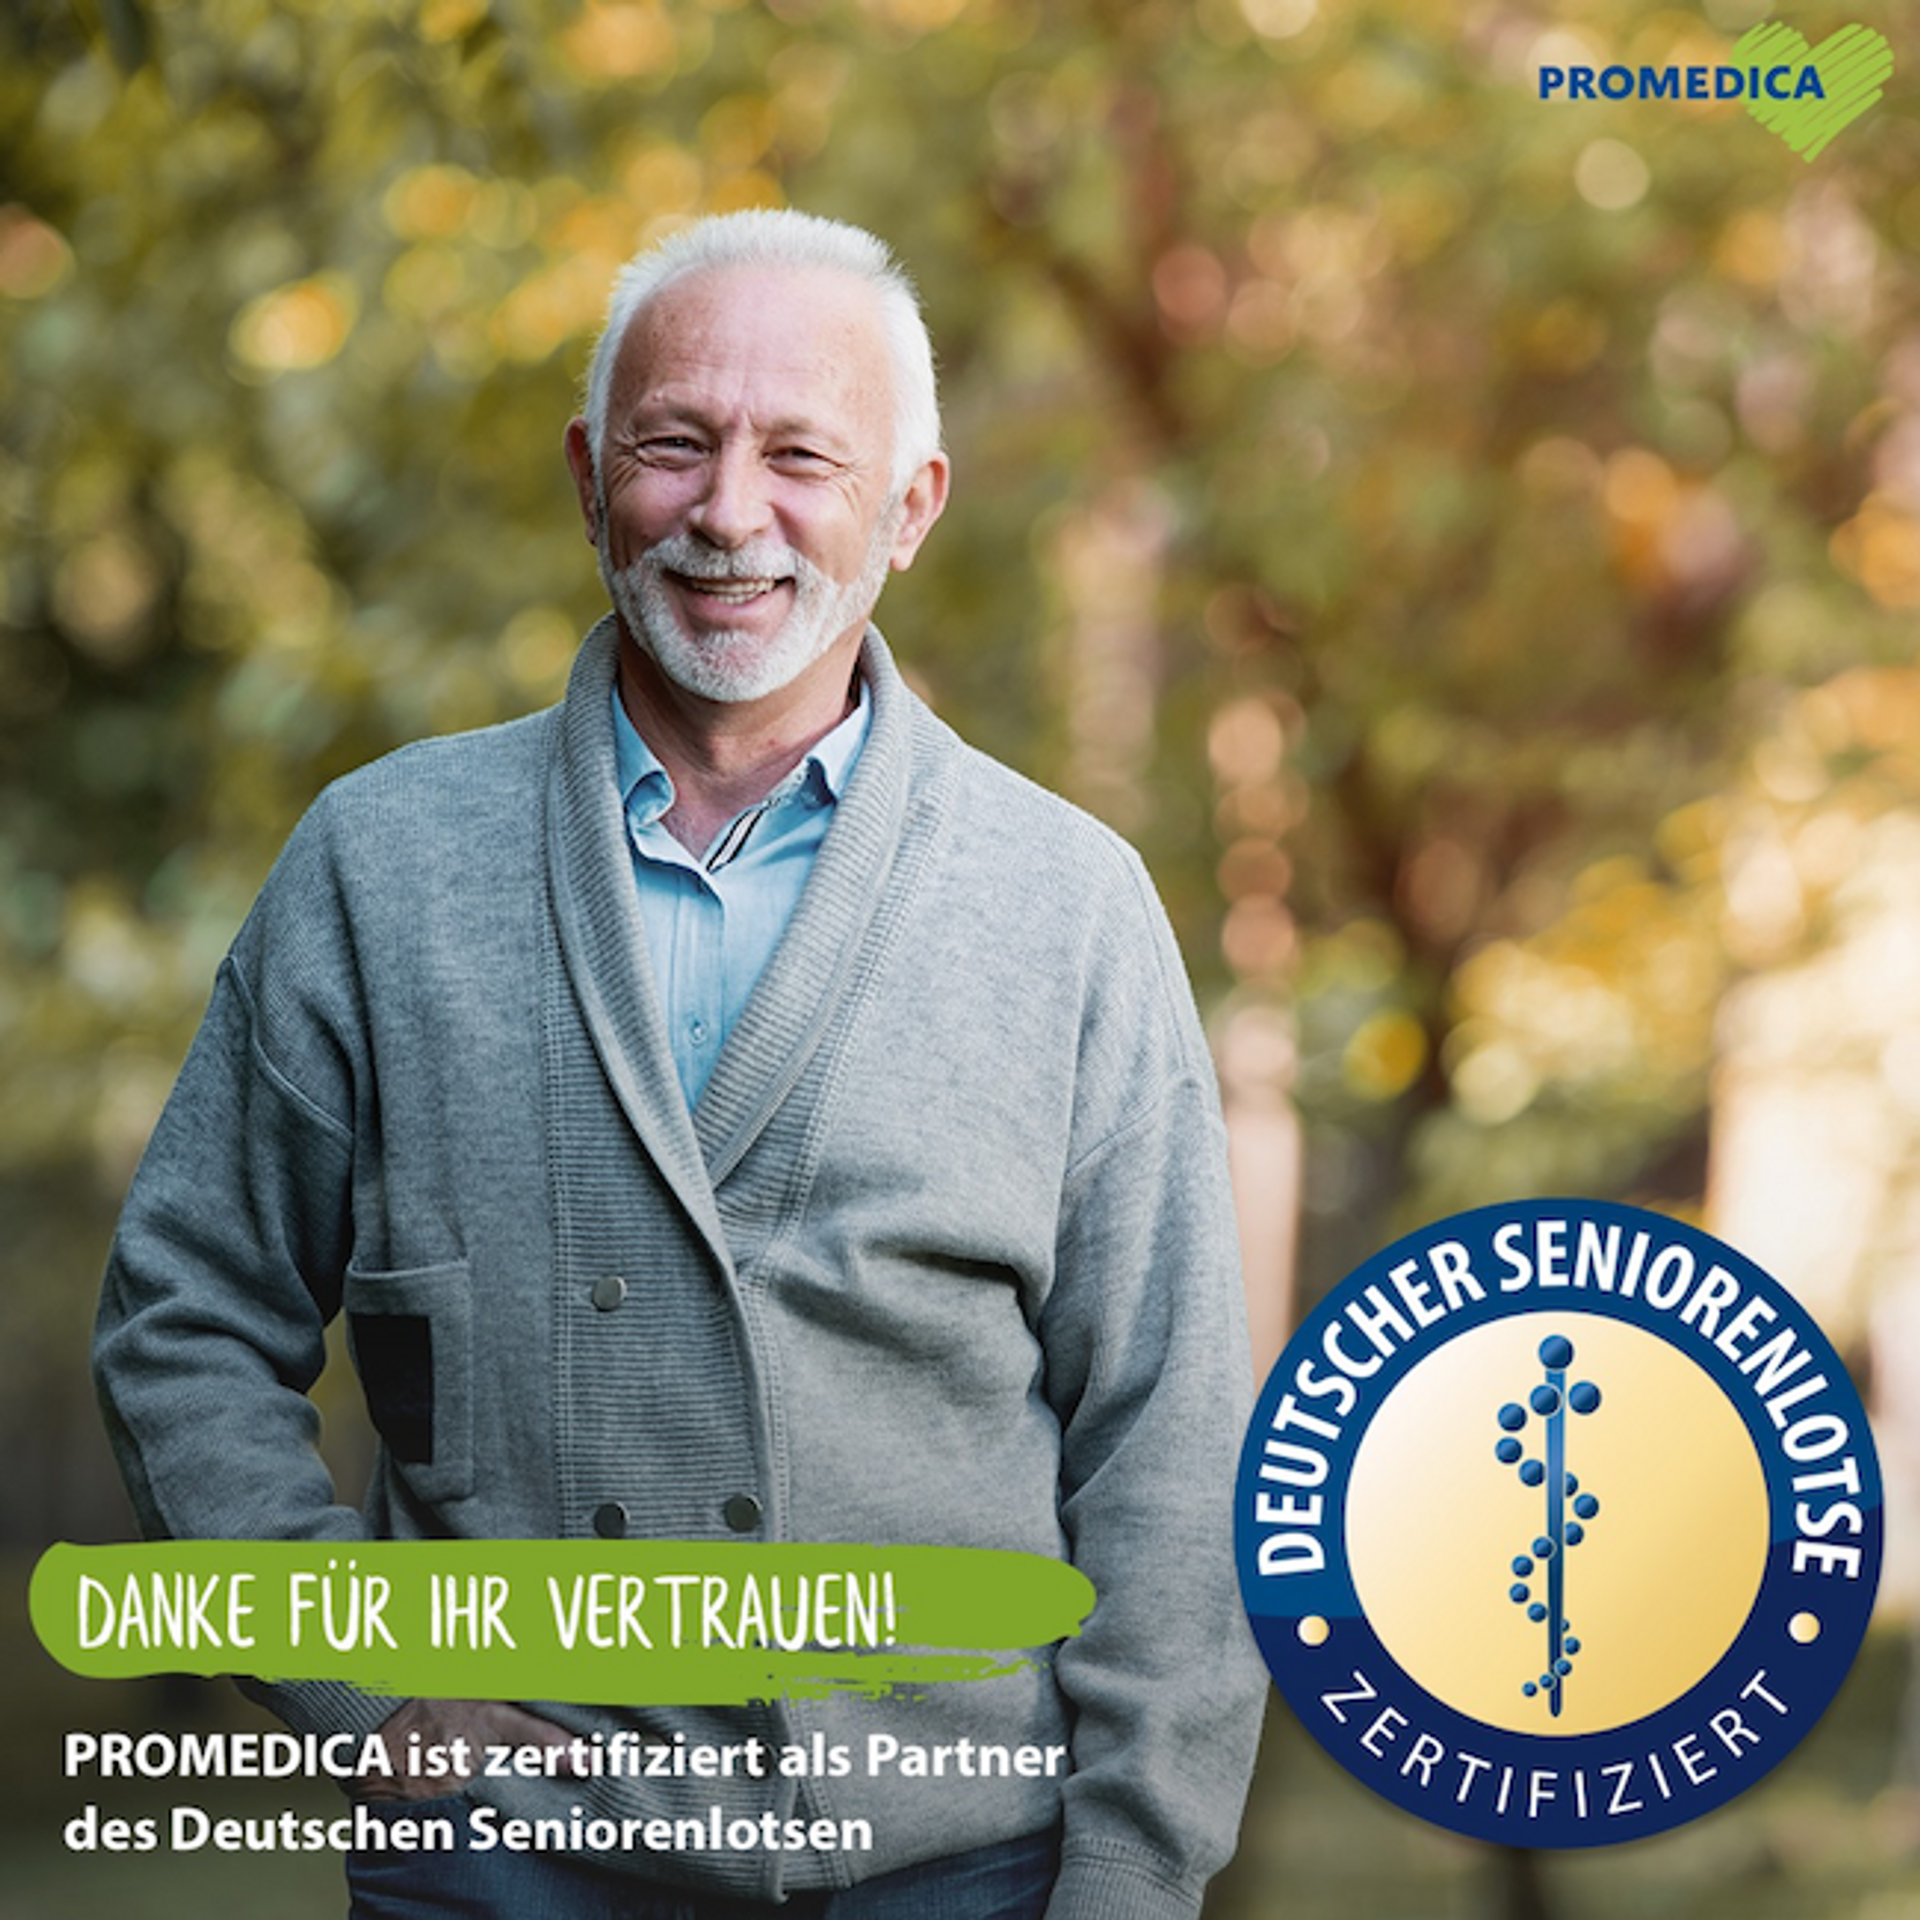 PROMEDICA PLUS: Zertifizierter Partner des Deutschen Seniorenlotsen